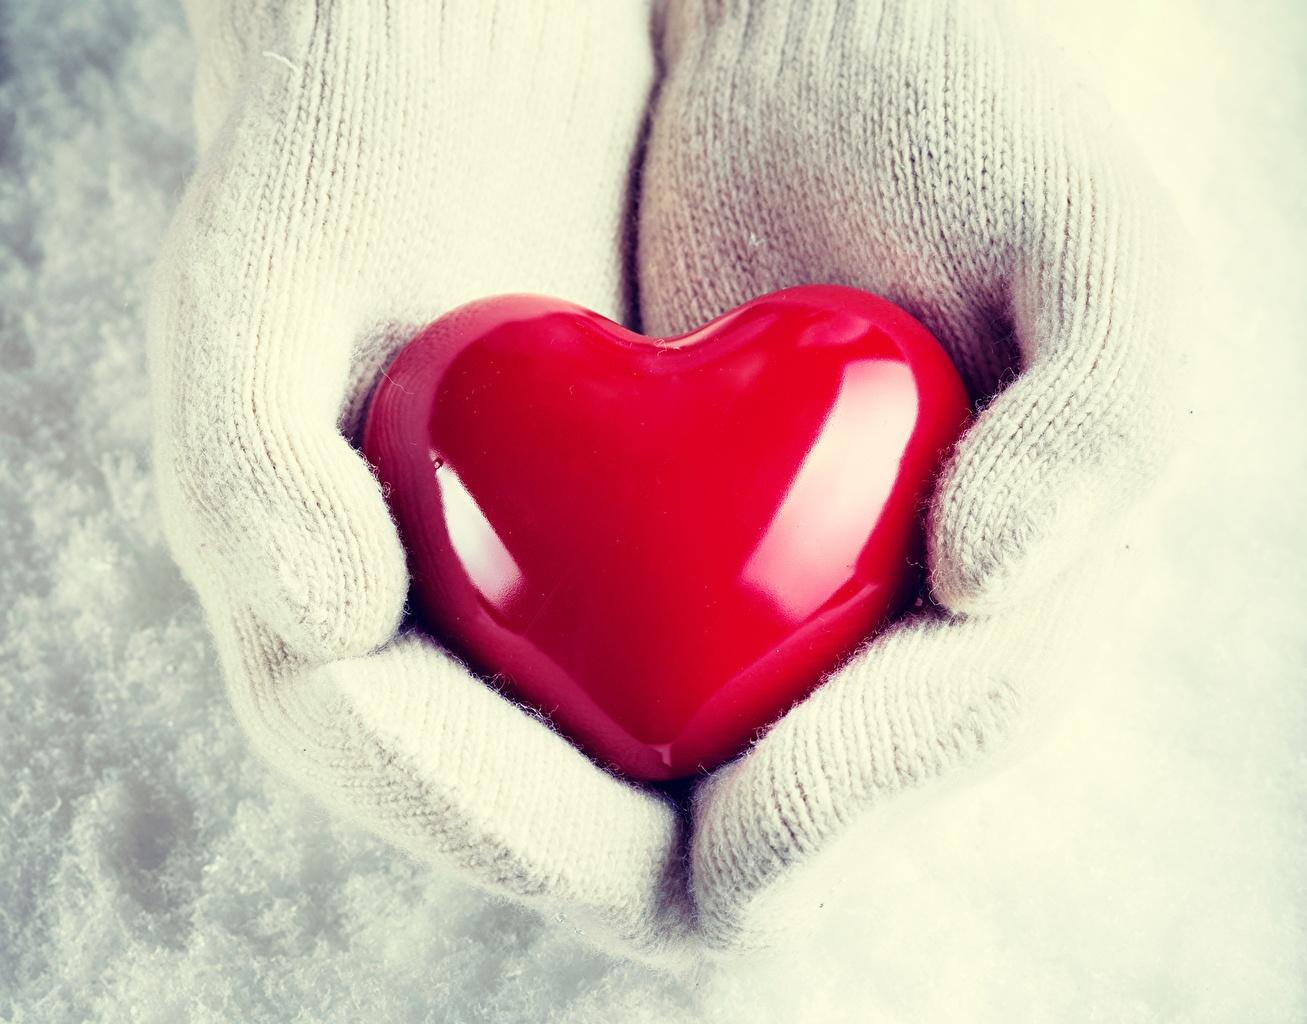 Picture Heart mittens Hands Closeup